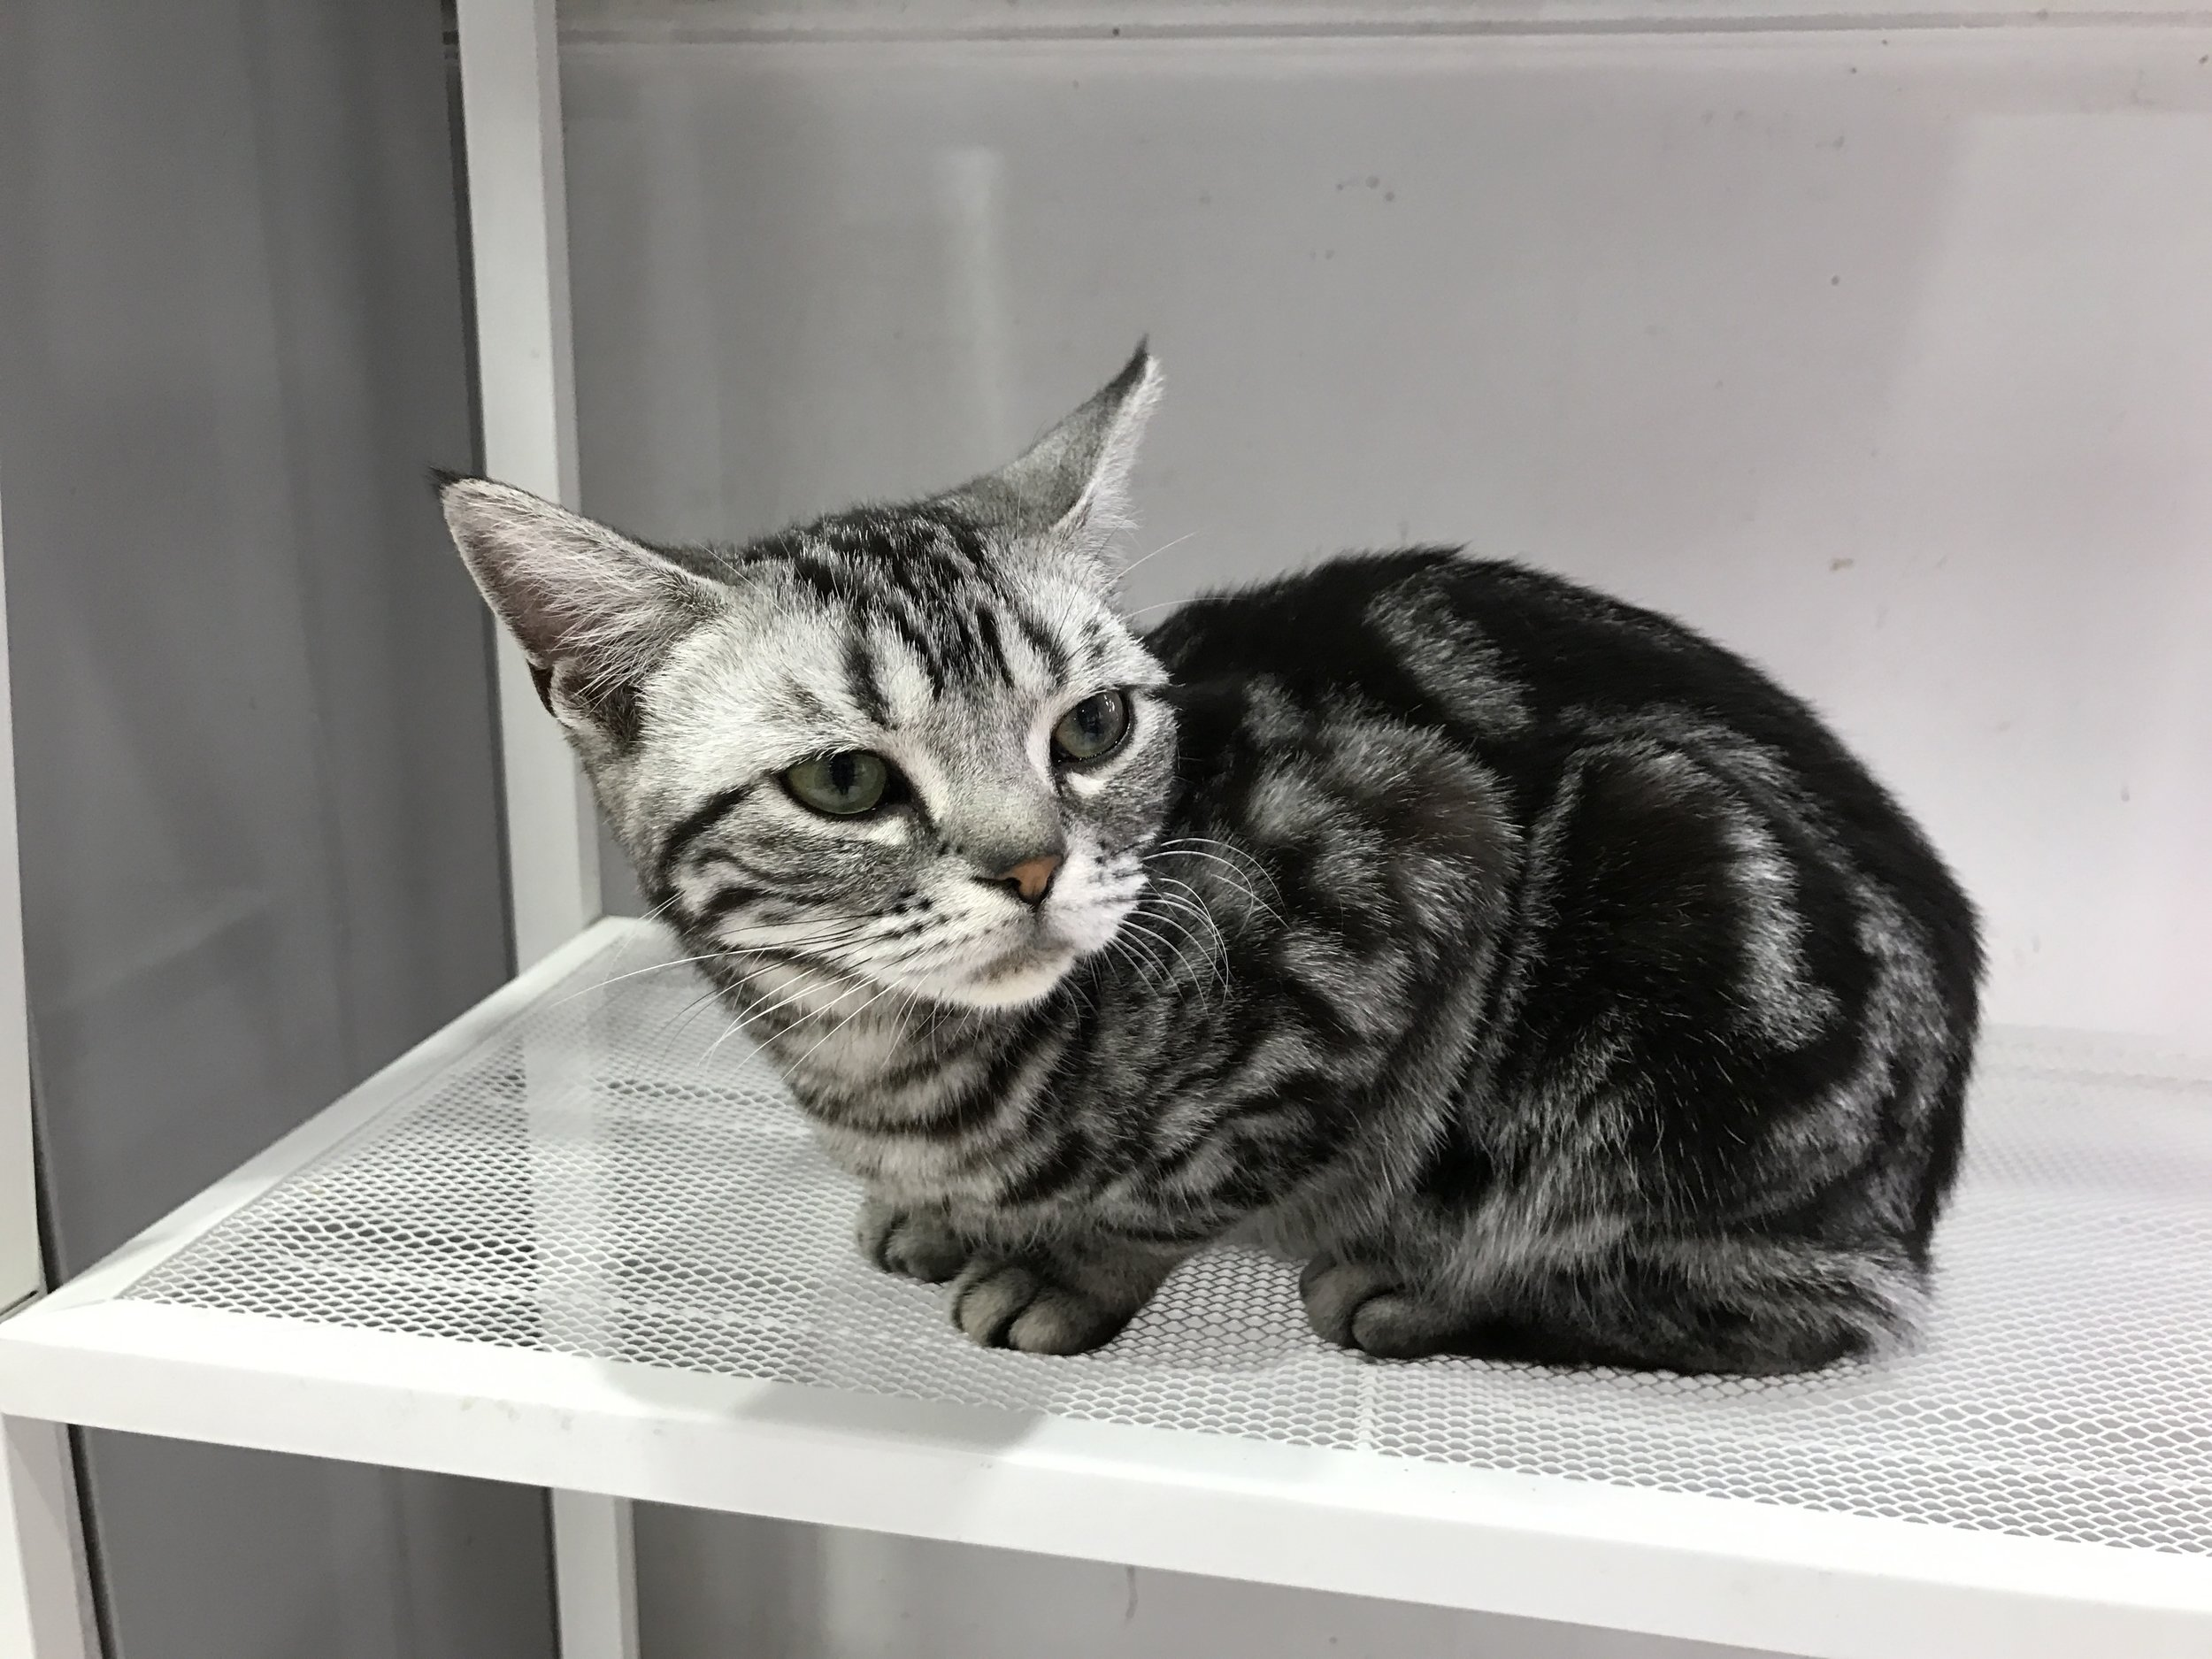 An adorable kitten at Cat Posthouse